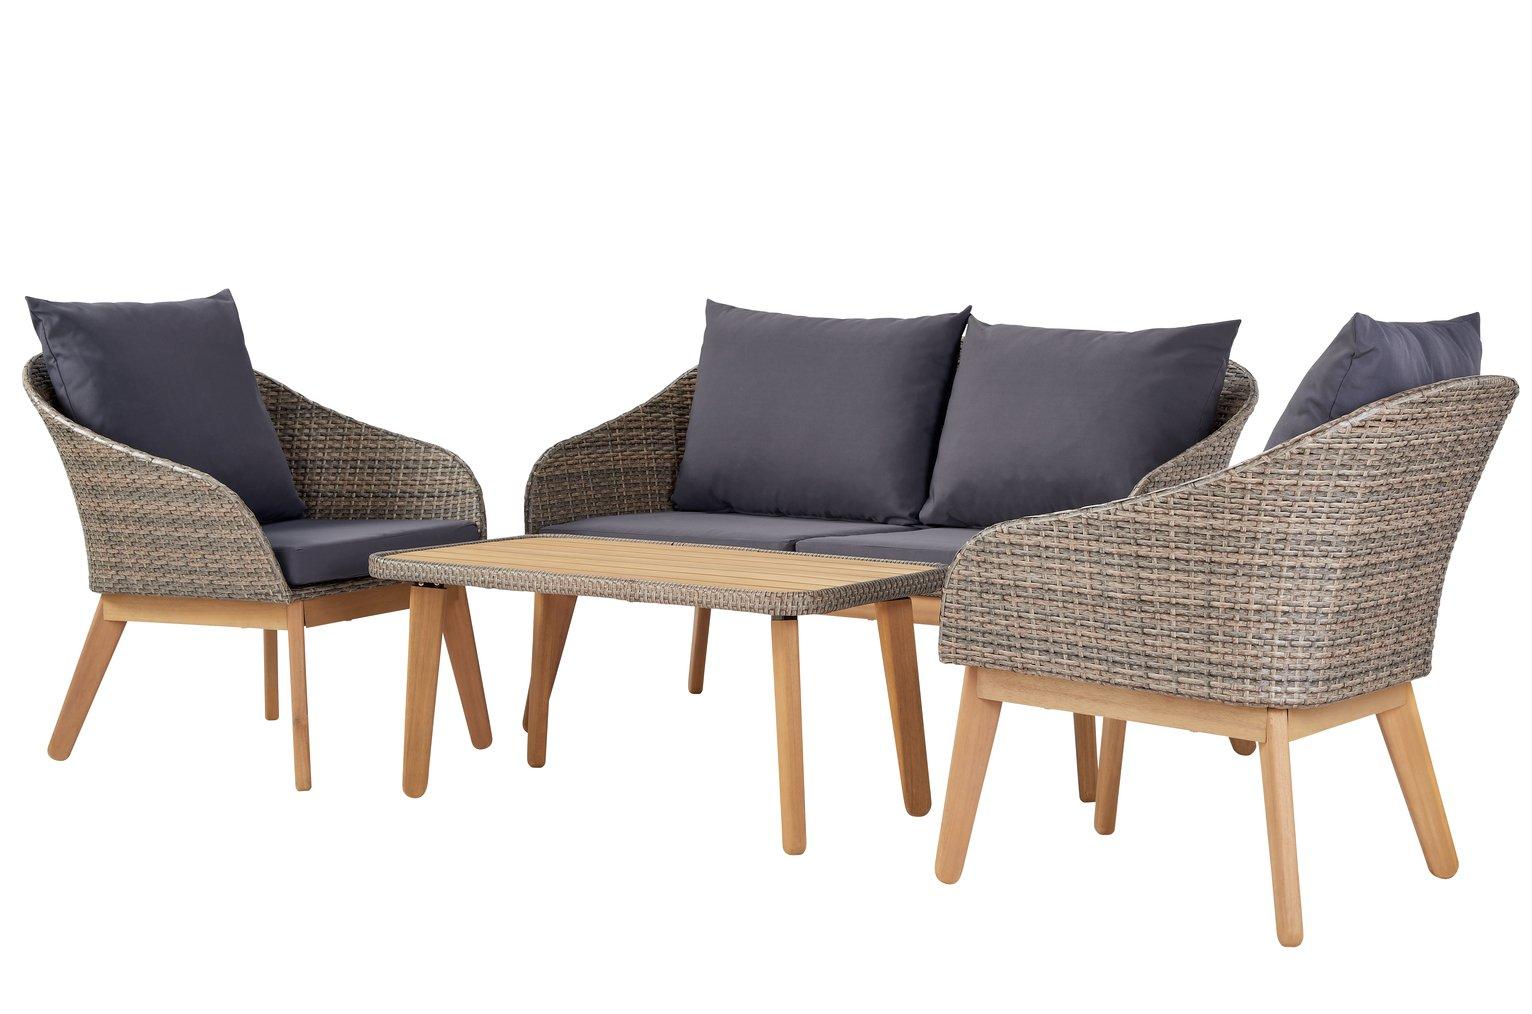 Argos Home 4 Seater Rattan Effect Sofa Set